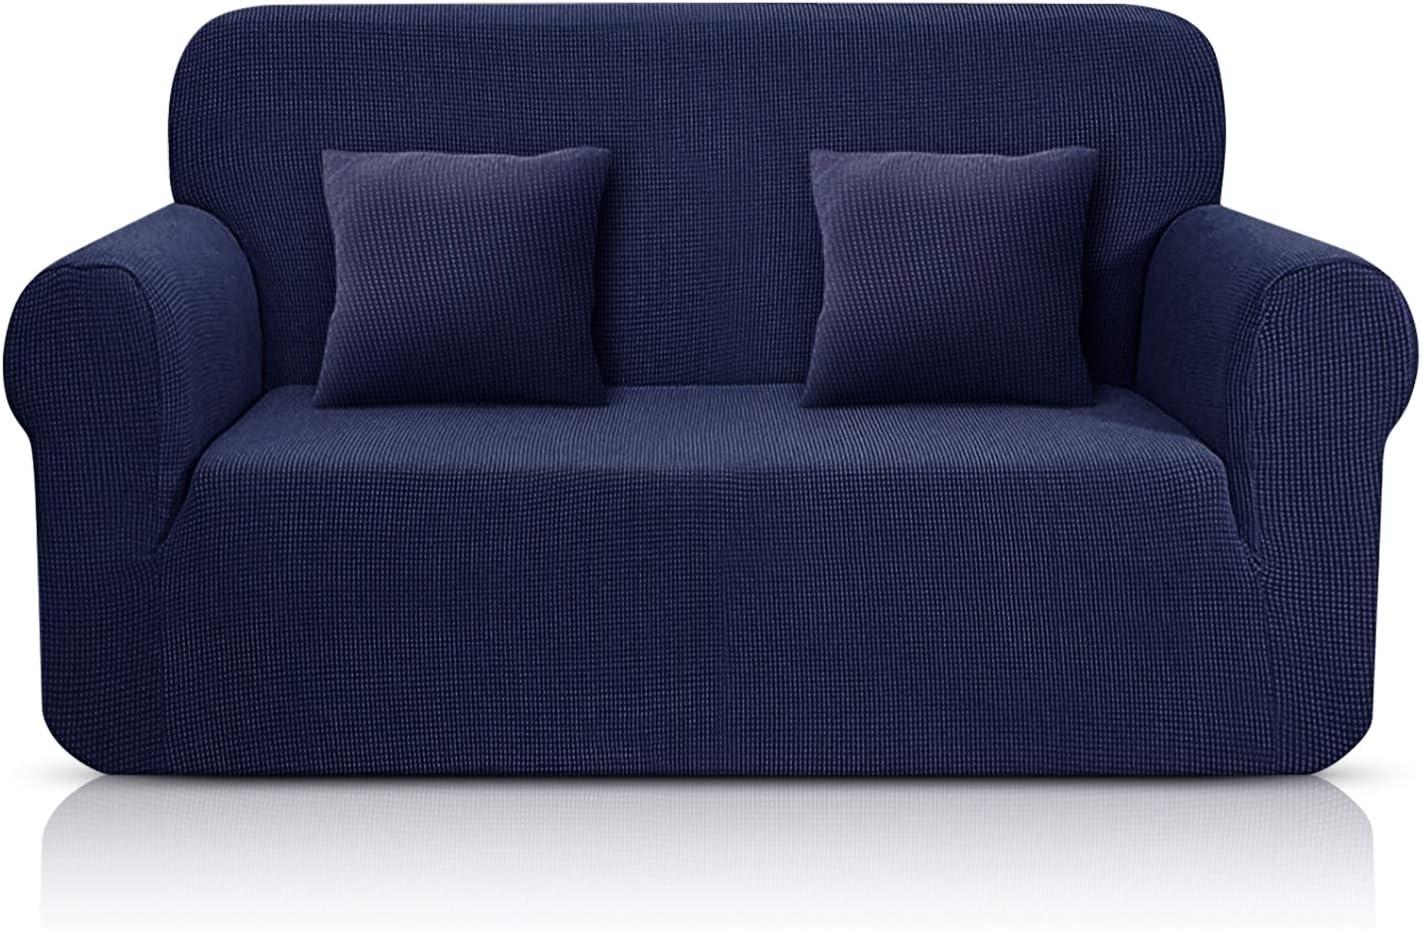 TAOCOCO Funda de Sofá/Funda de sofá Antideslizante/Funda de Fofá Elástica/Lavable/Antiácaros/Antiarrugas (Azul Oscuro/ 2 Plazas 120-190 cm)